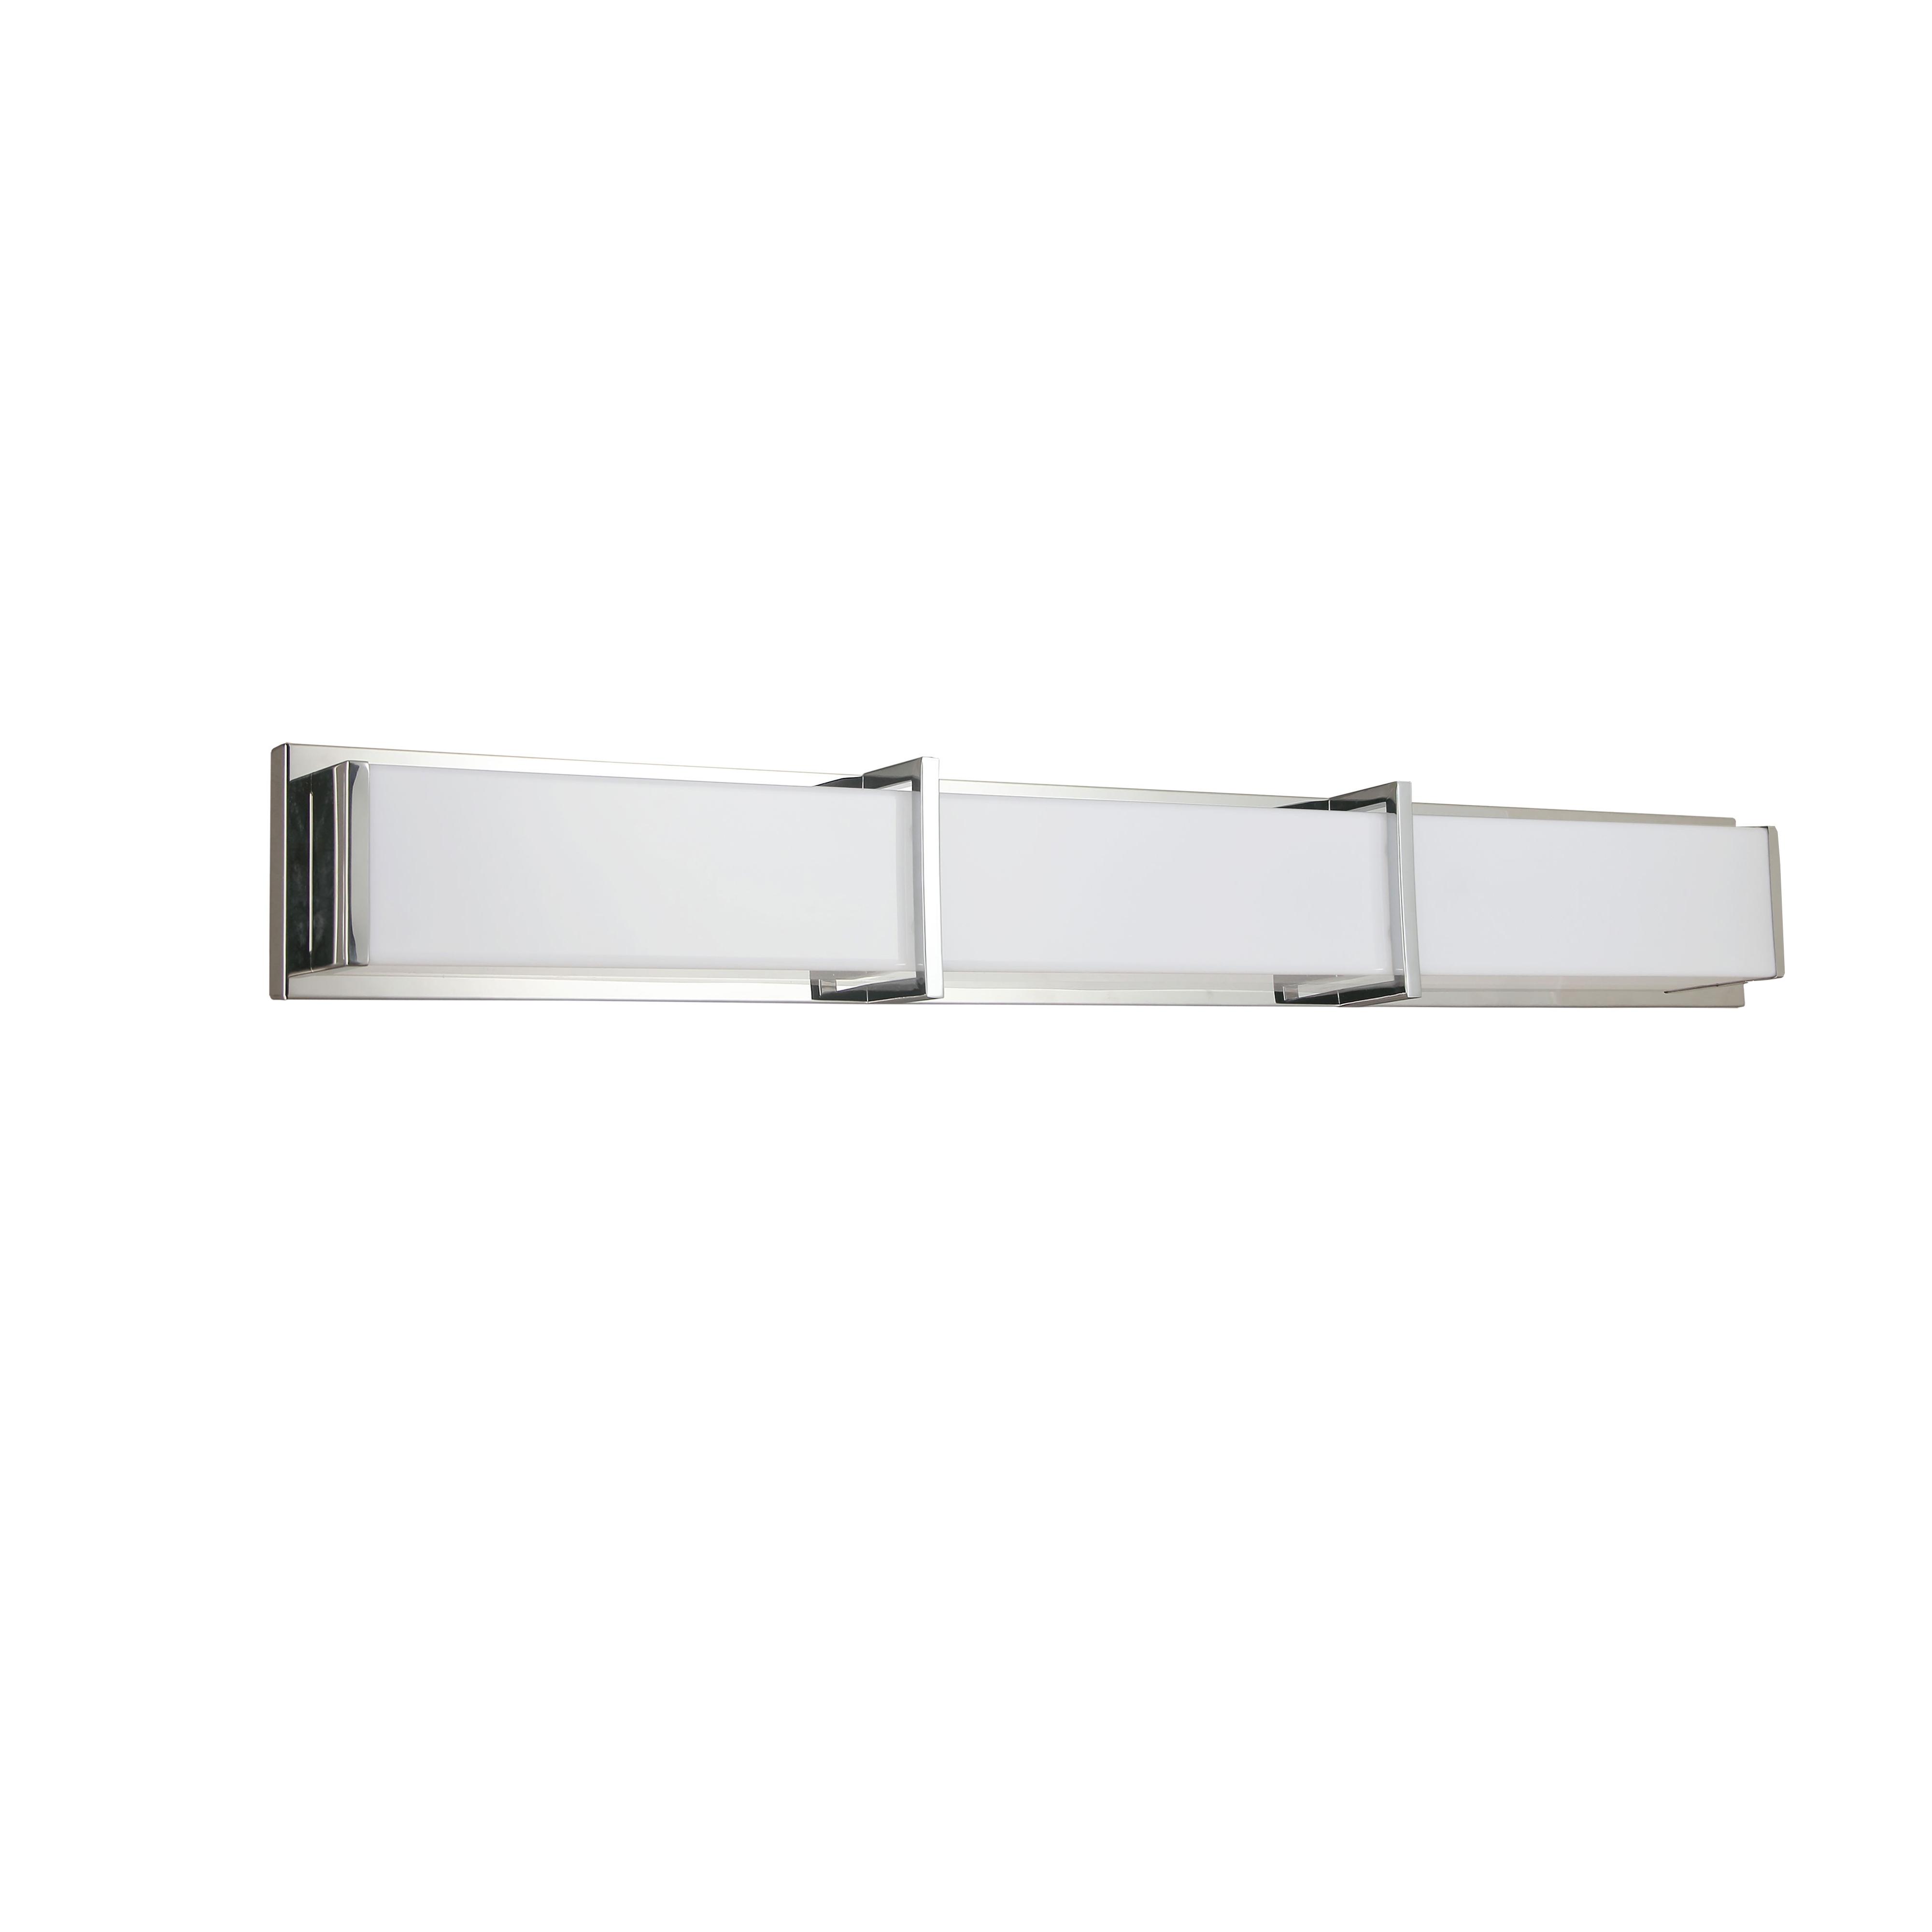 50W Polished Chrome Vanity Light w/ White Acrylic Diffuser